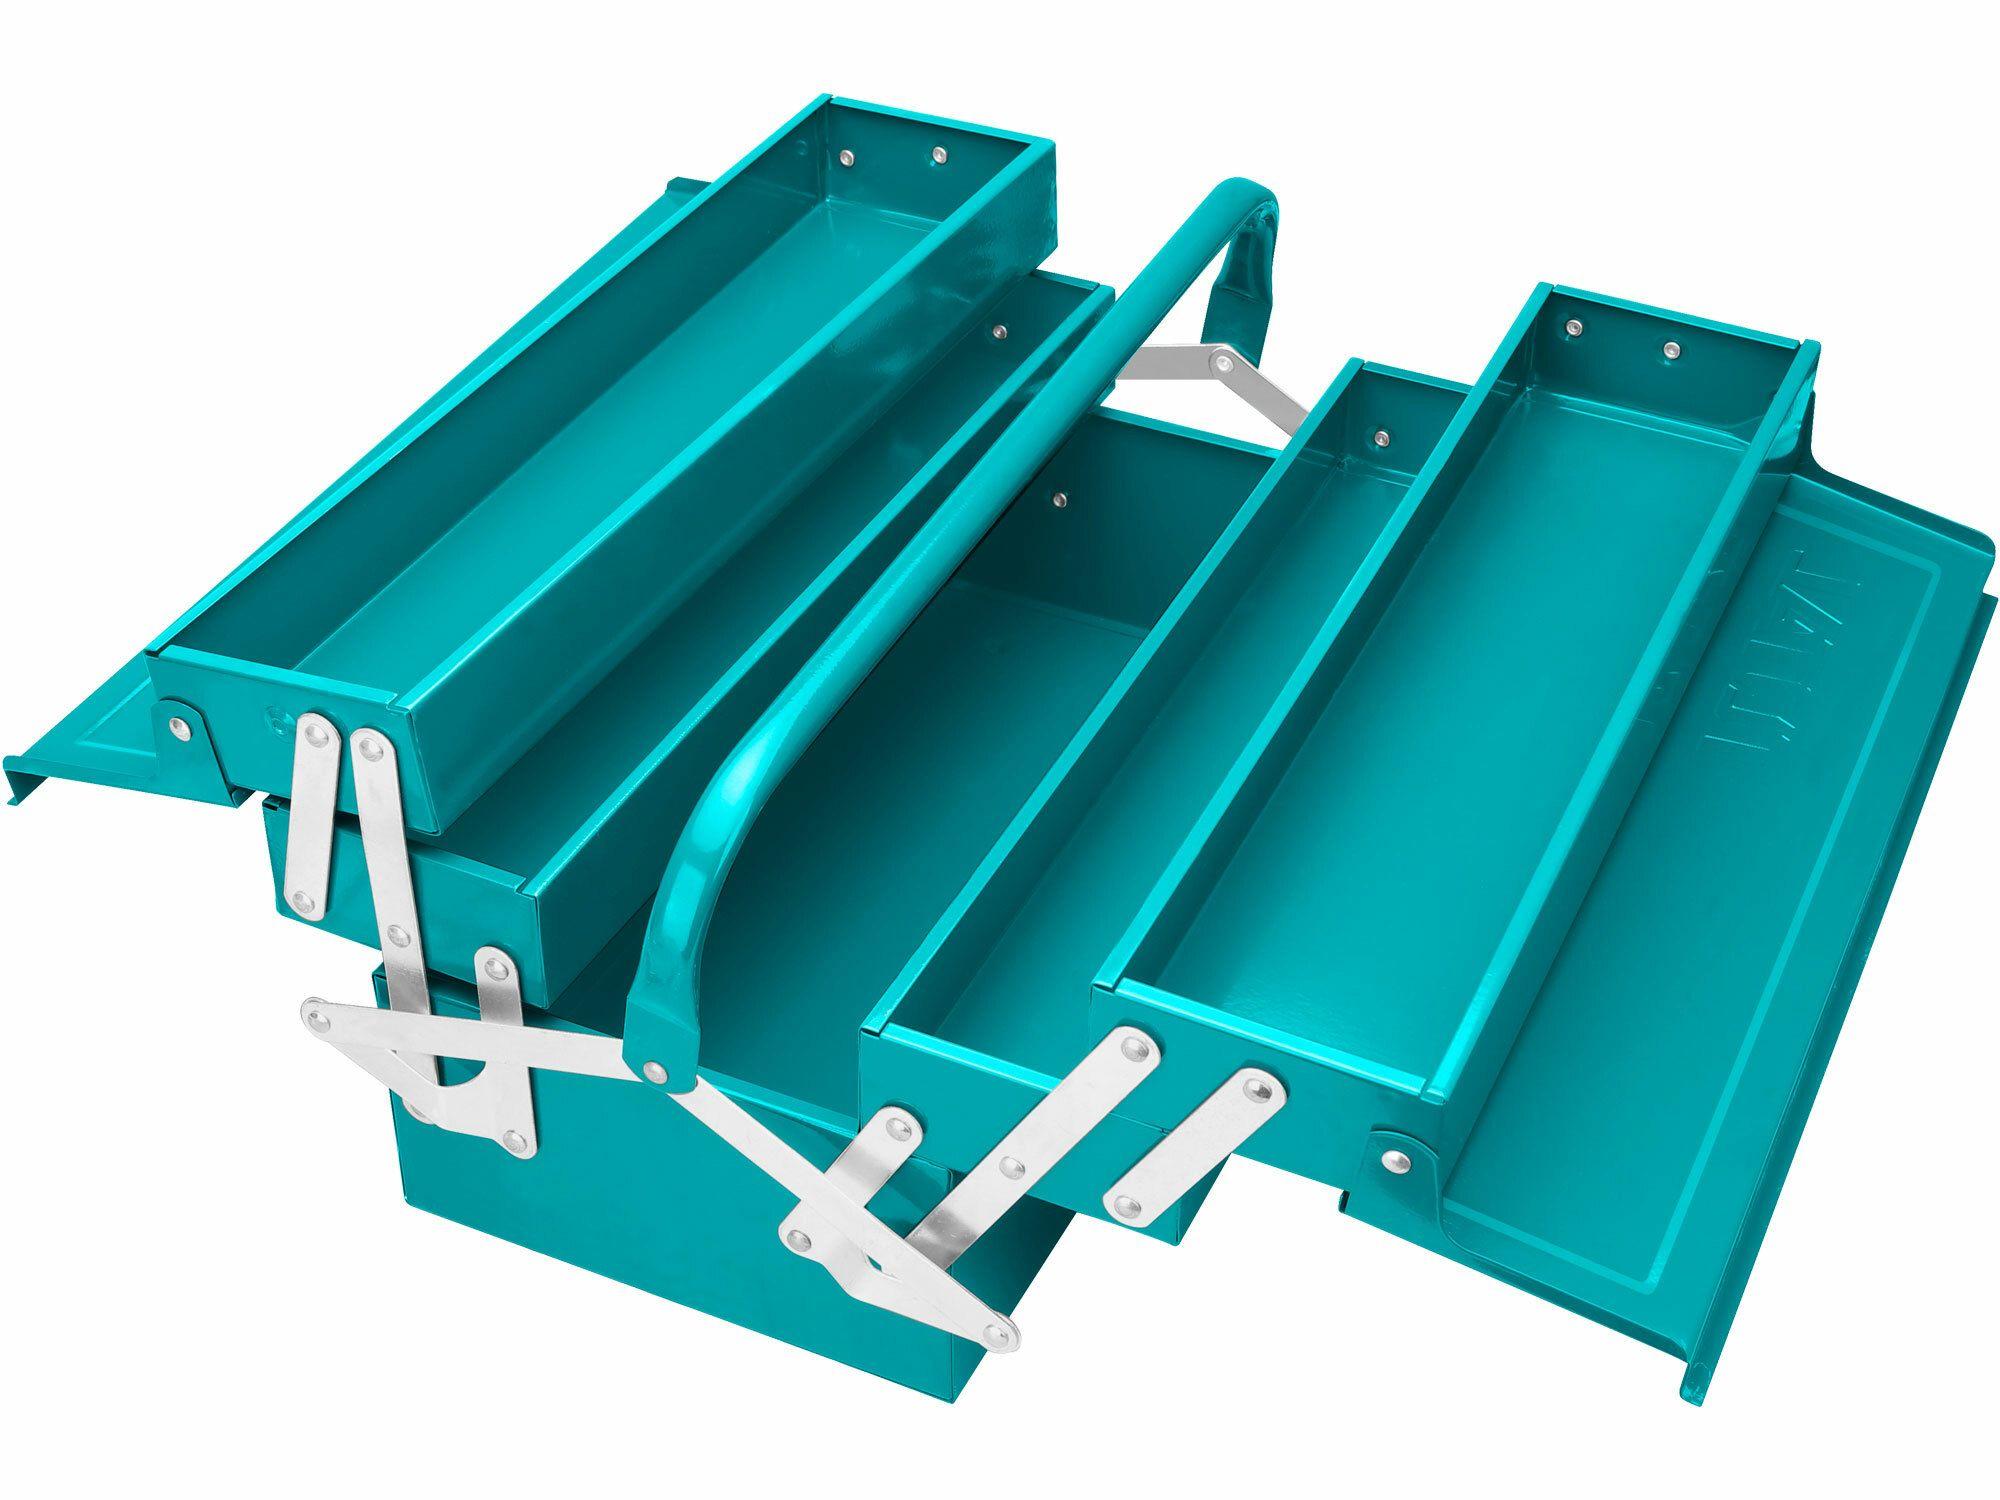 Kufr na nářadí kovový, industrial TOTAL-TOOLS